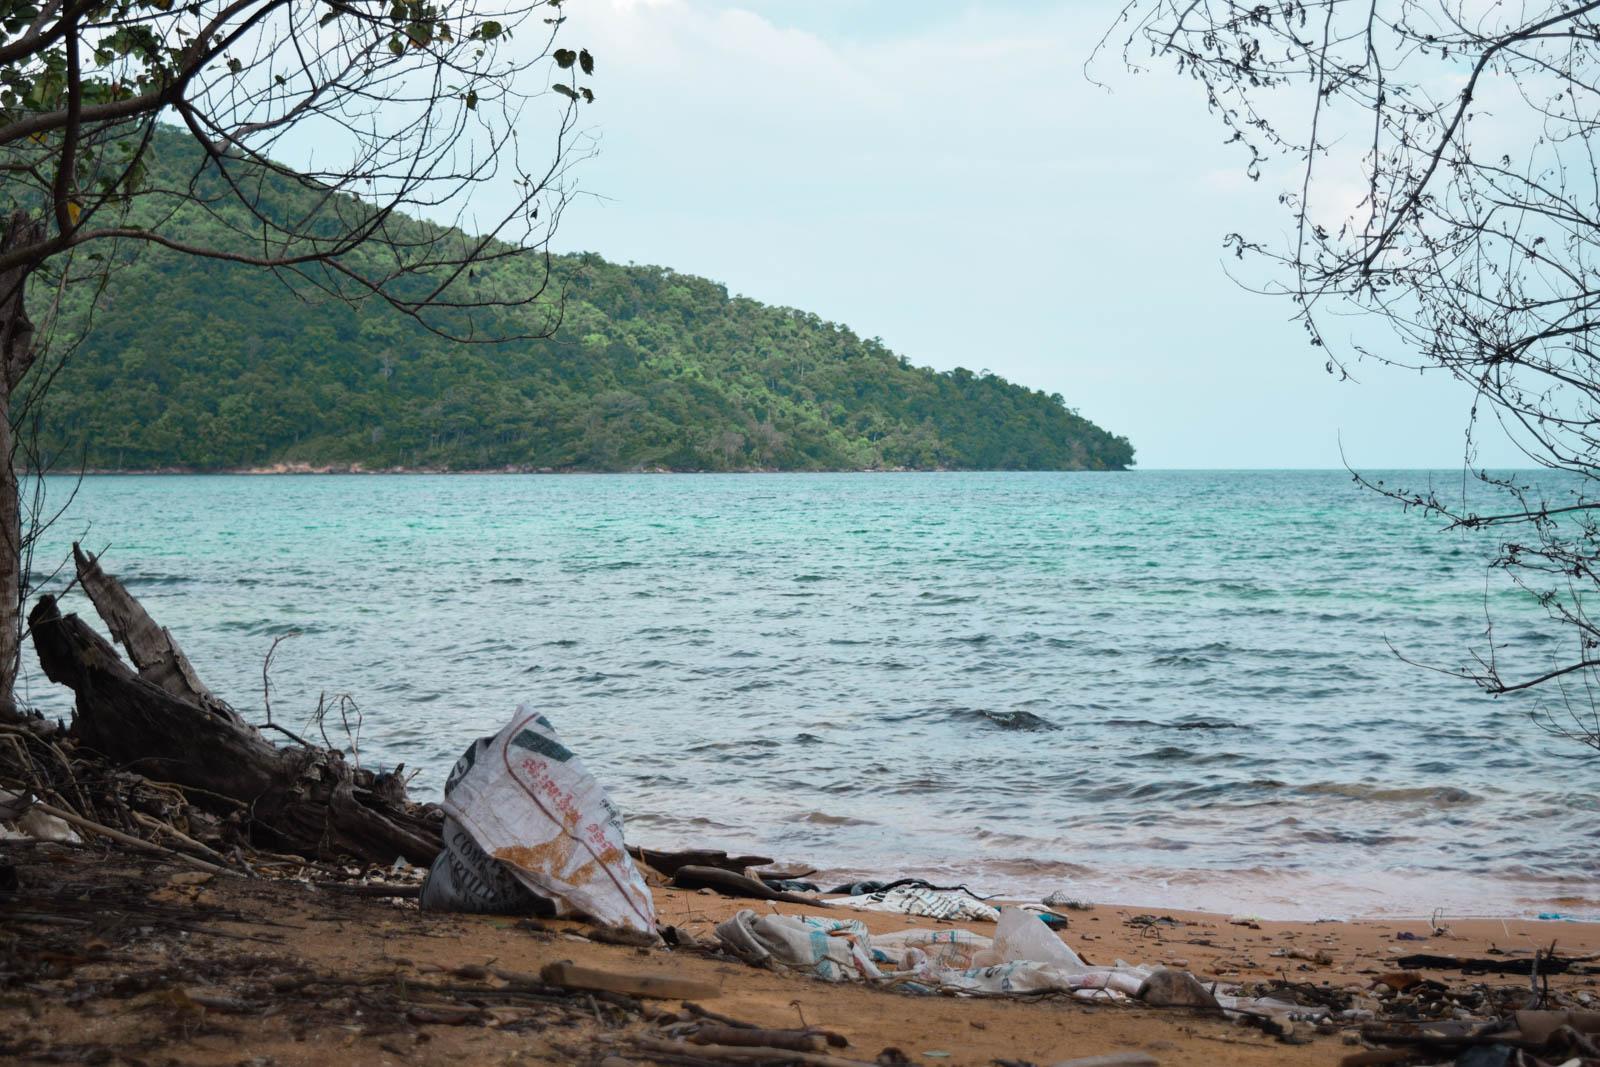 Playa con basura - Camboya